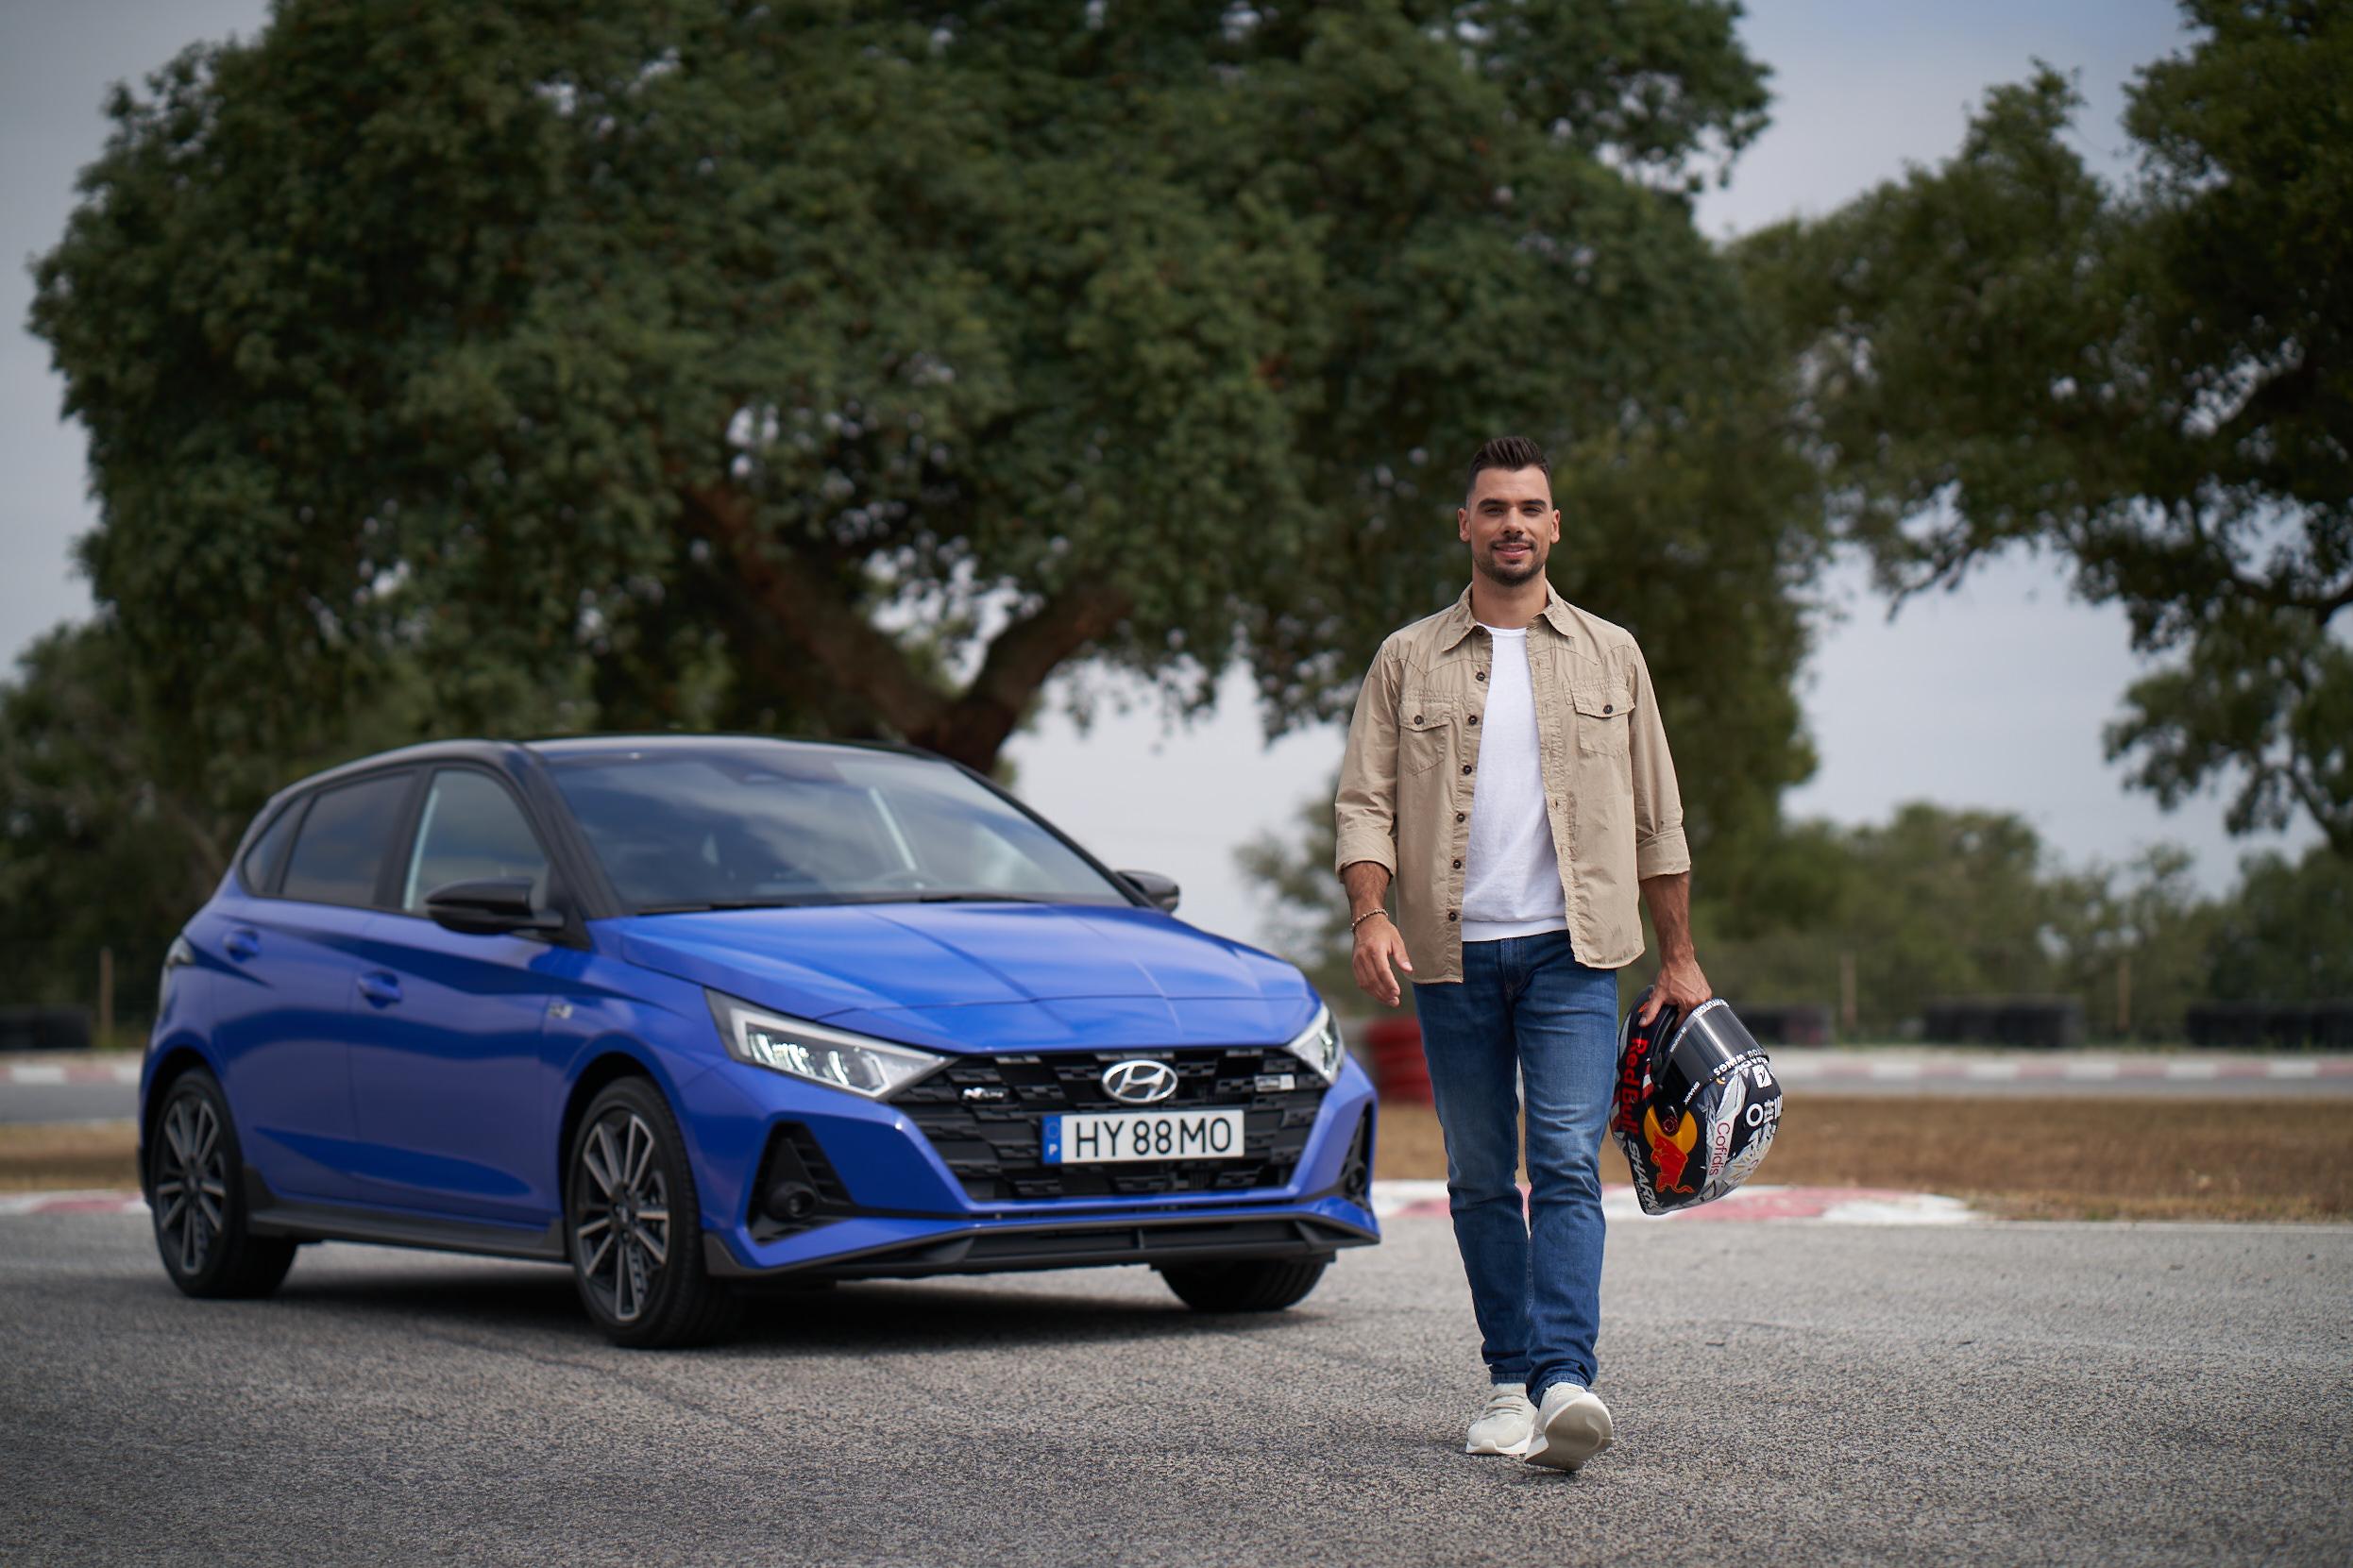 Hyundai i20 Miguel Oliveira